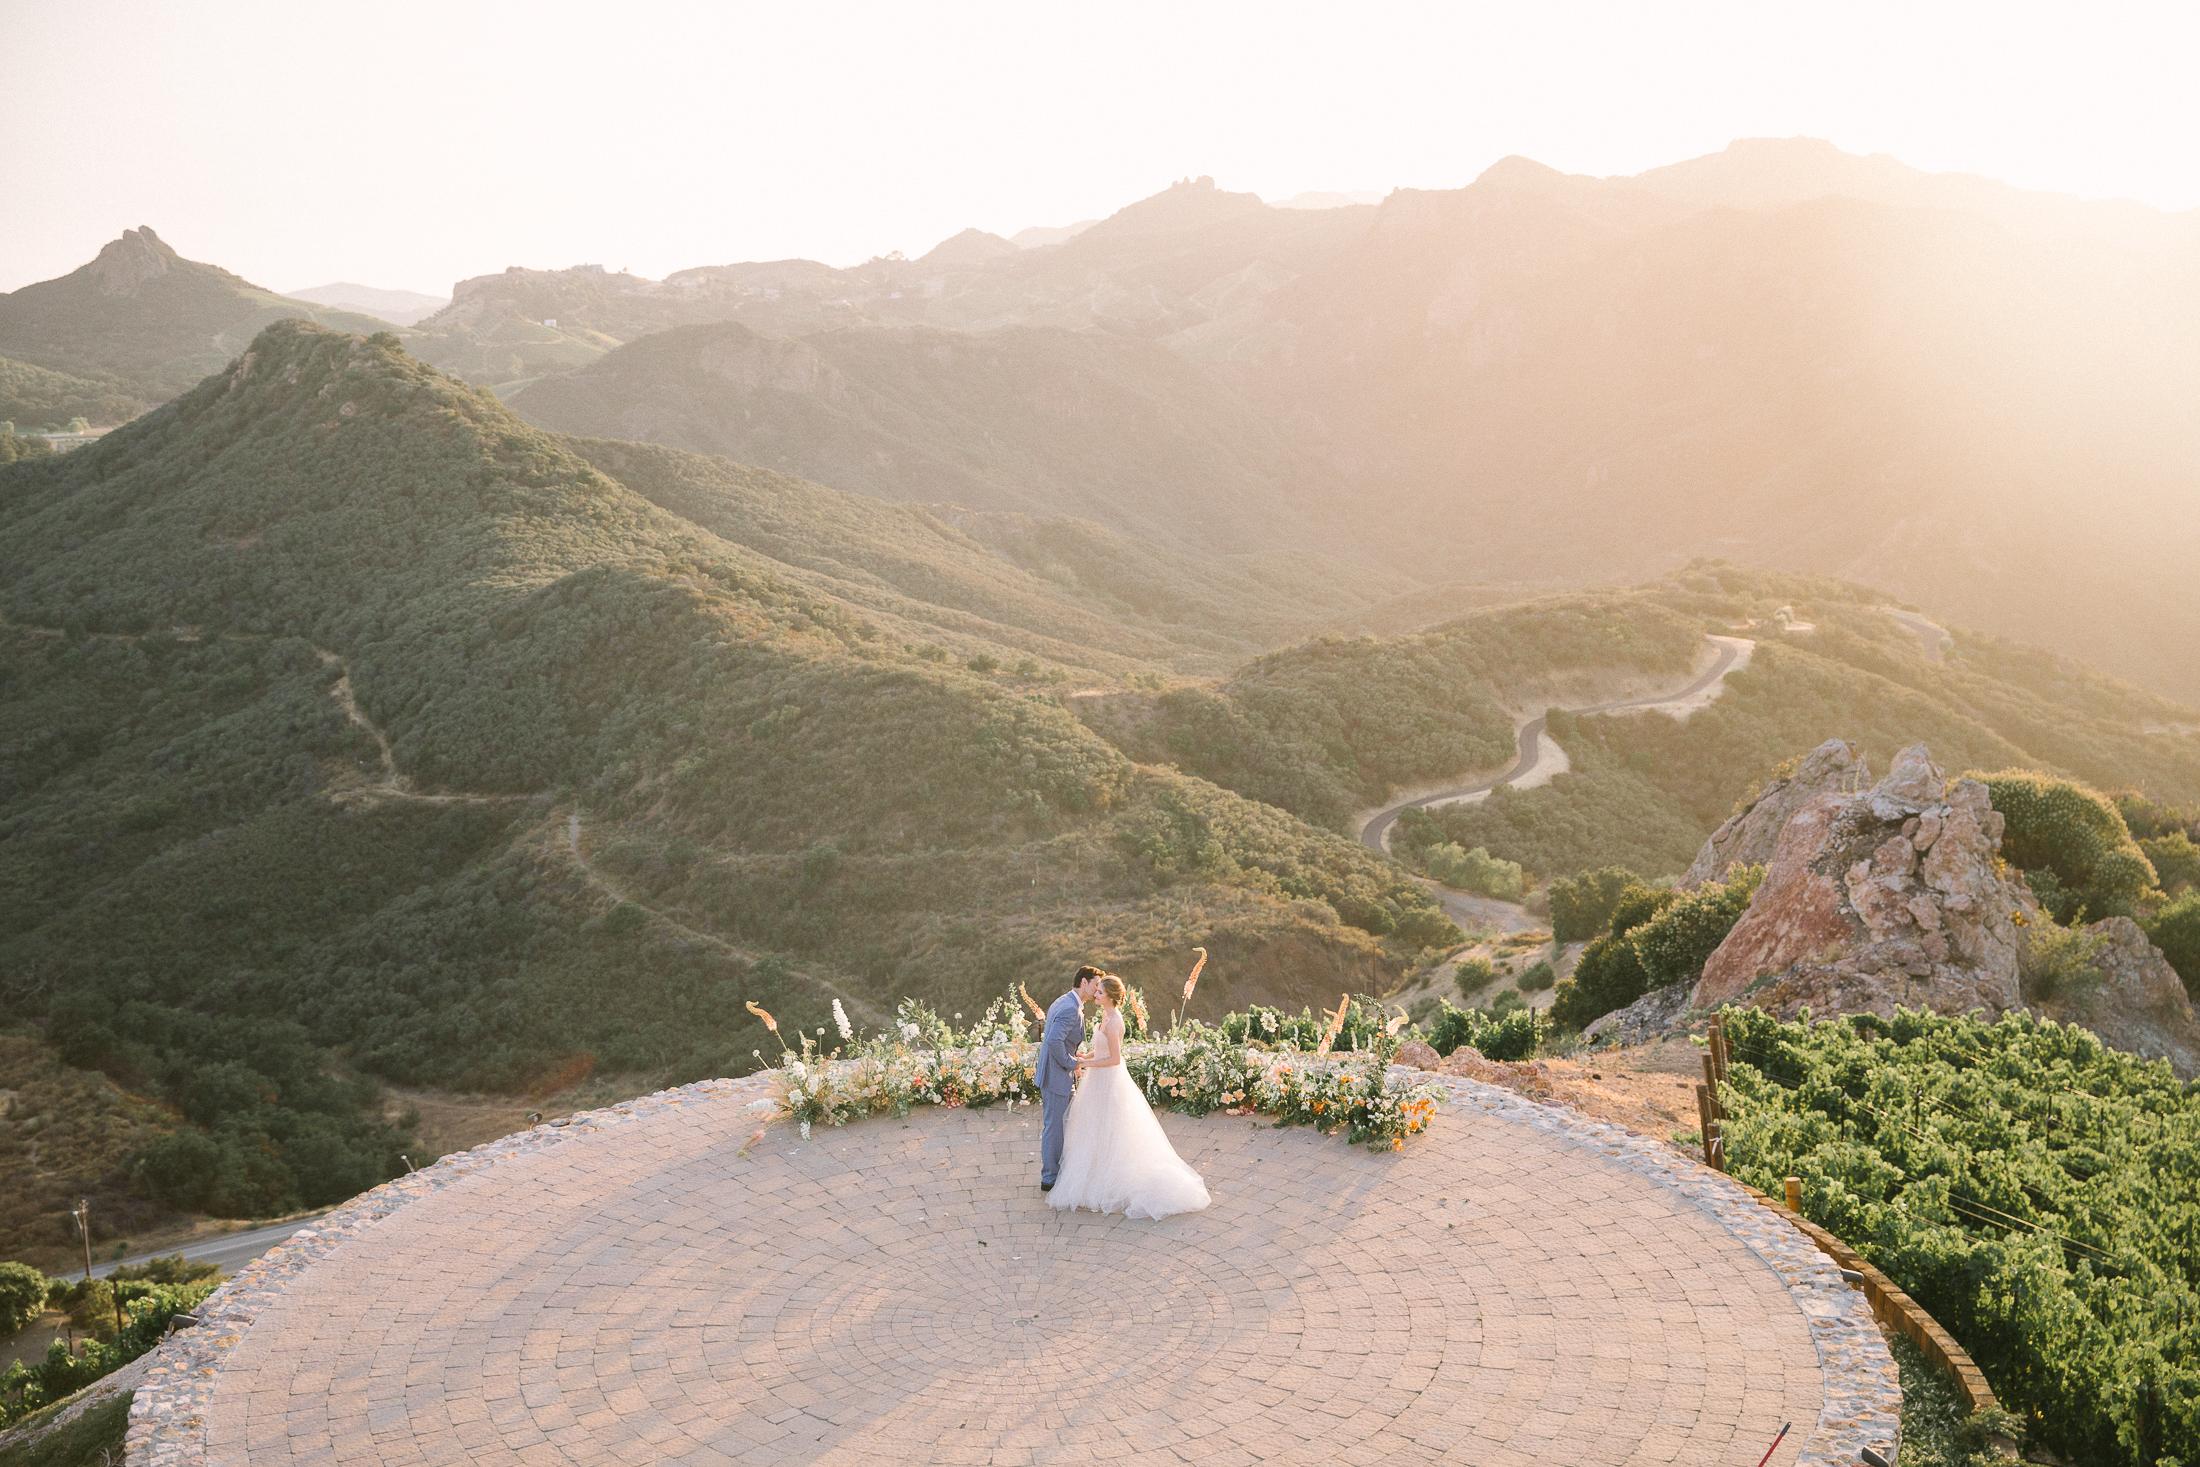 Ellen-Ashton-Photography-California-Wedding-Photographer-Malibu-Rocky-Oaks-Weddings-girt-and-gold19.jpg